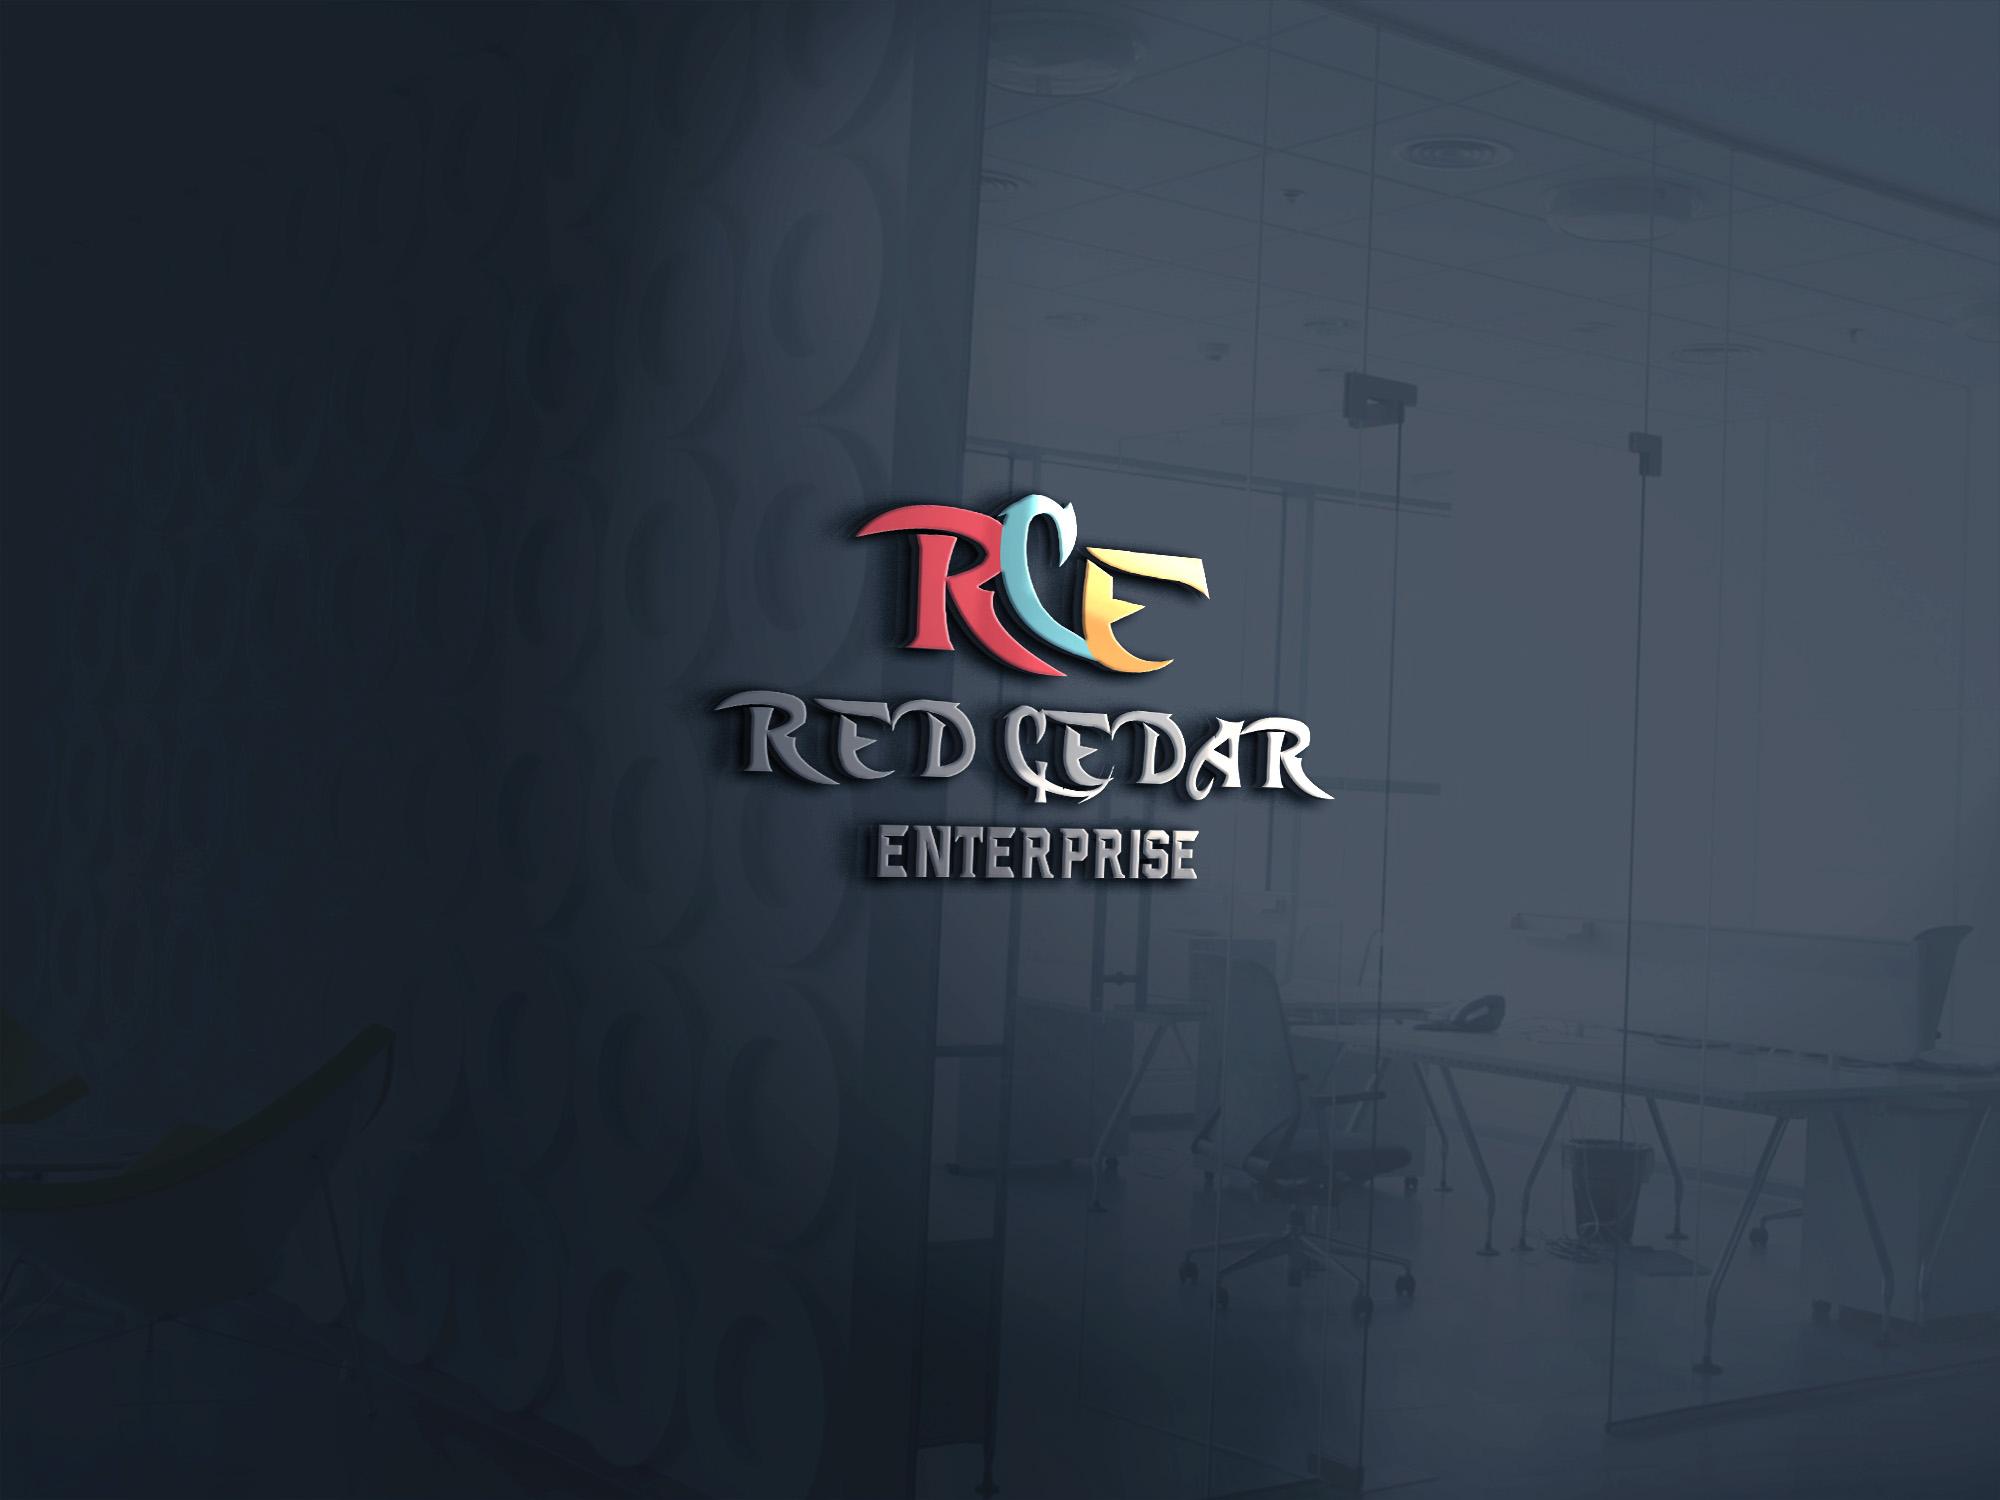 Logo Design by umair - Entry No. 39 in the Logo Design Contest Unique Logo Design Wanted for Red Cedar Enterprise.